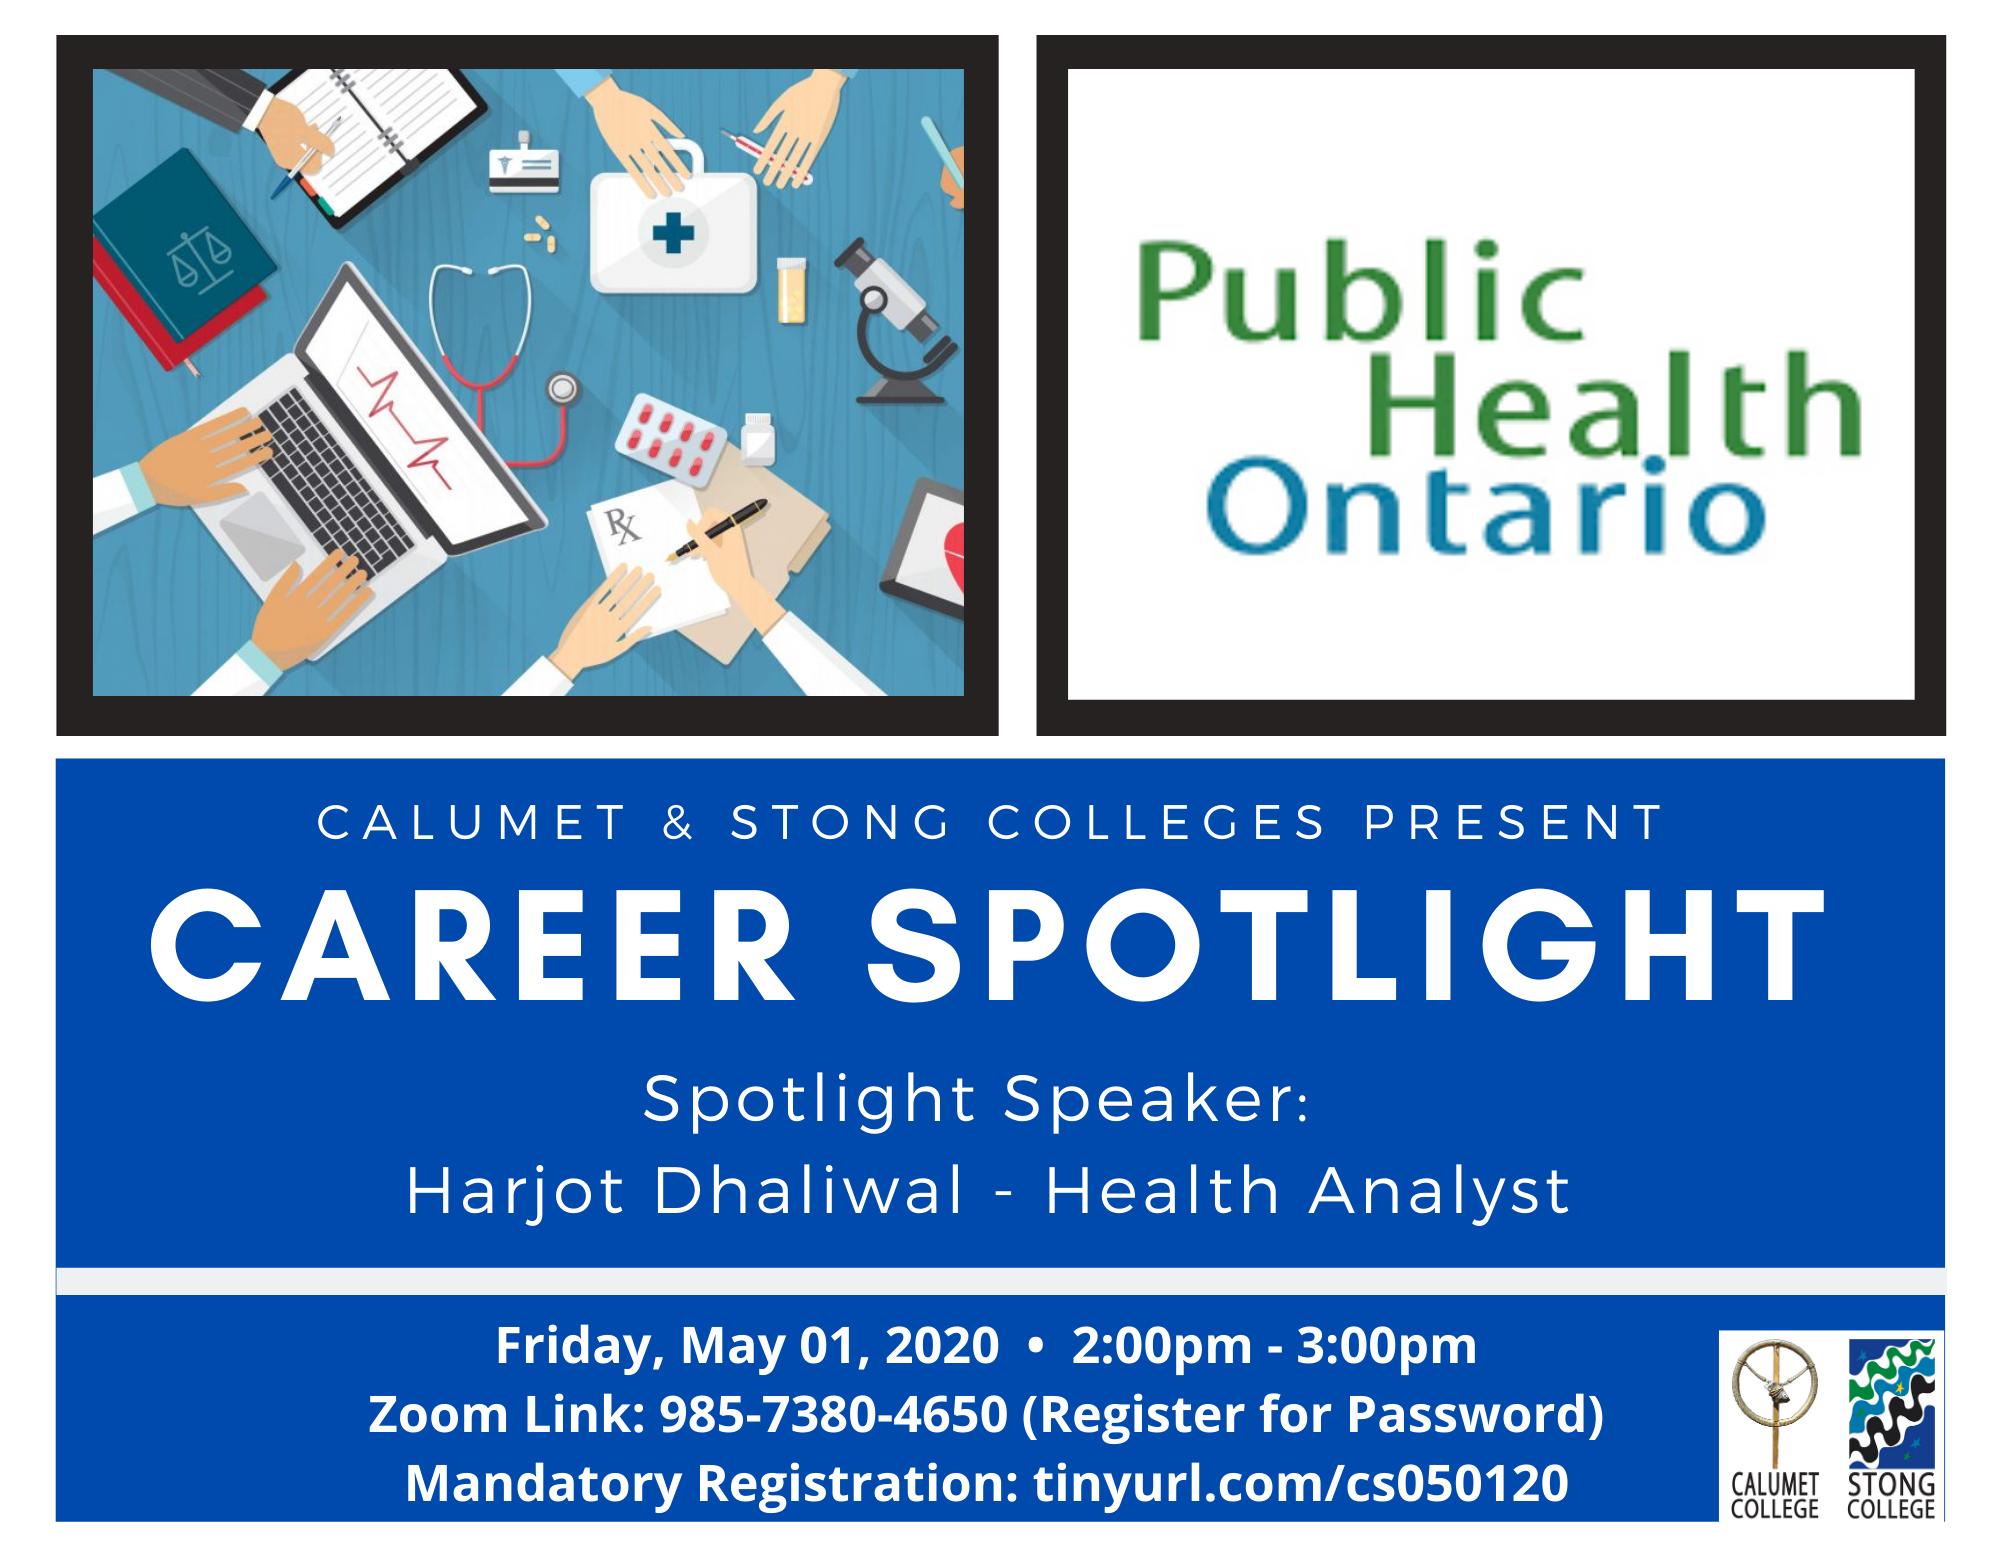 CAREER SPOTLIGHT: HARJOT DHALIWAL – HEALTH ANALYST, PUBLIC HEALTH ONTARIO @ Zoom Meeting ID: 985-7380-4650